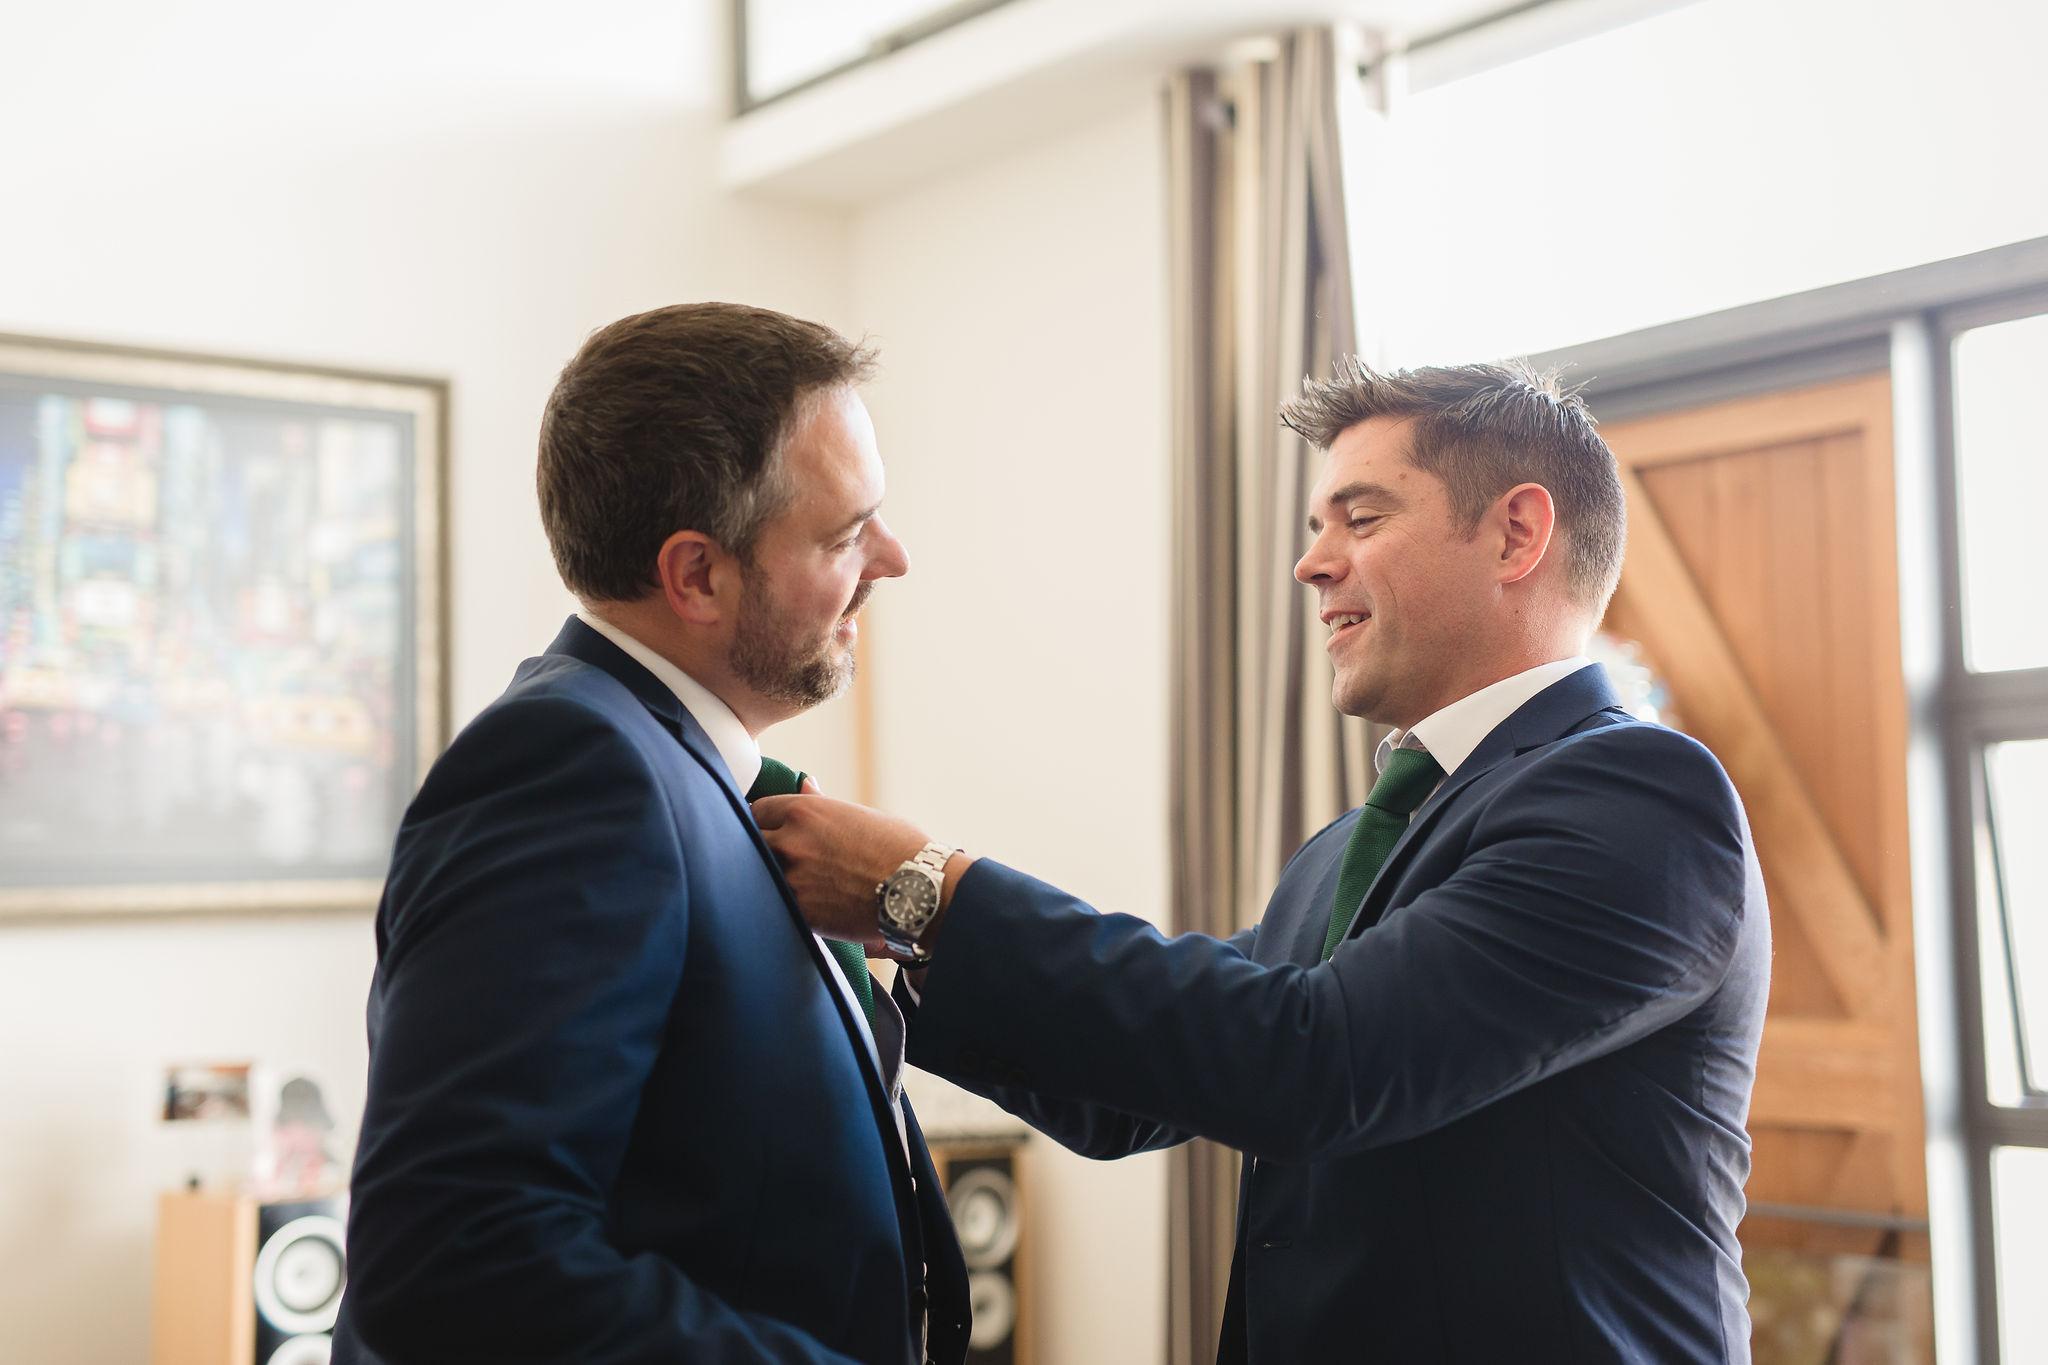 The Anthologist_Drake_and_Morgan_London_Wedding_18.jpg